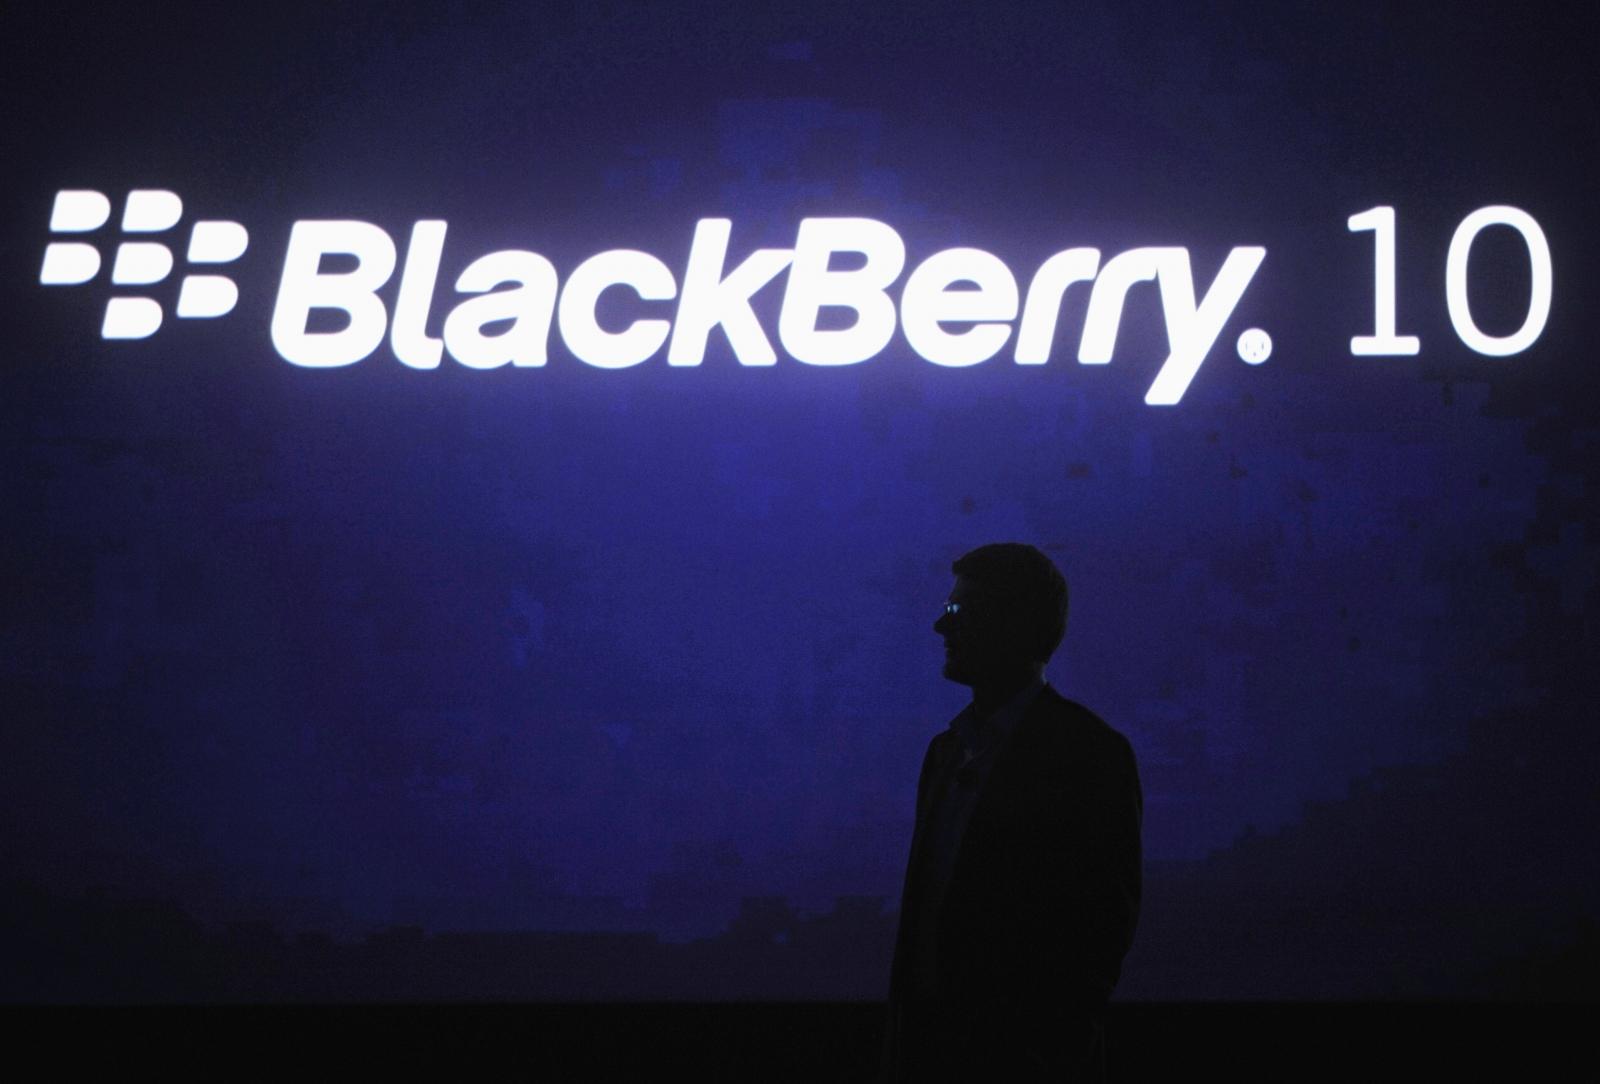 BlackBerry OS 10.3.2.2339